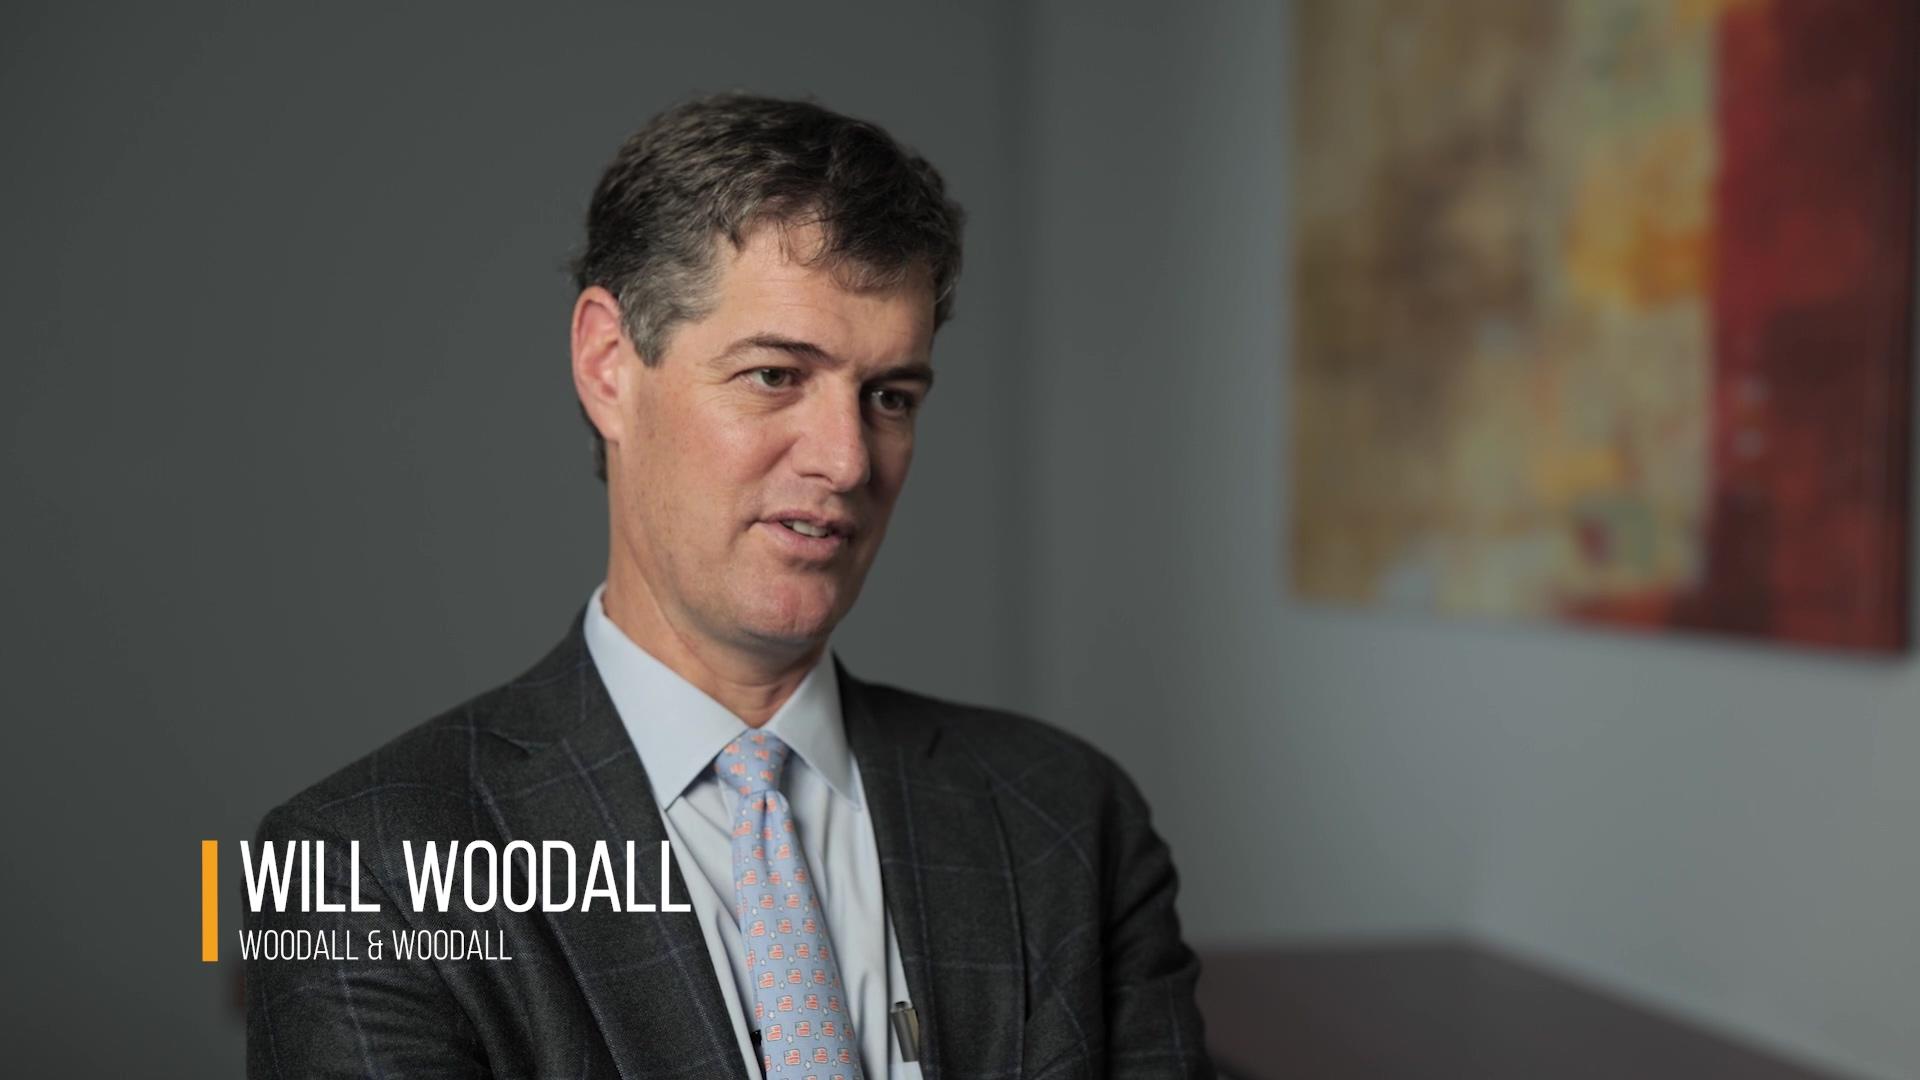 Woodall 2020 Will Video 1